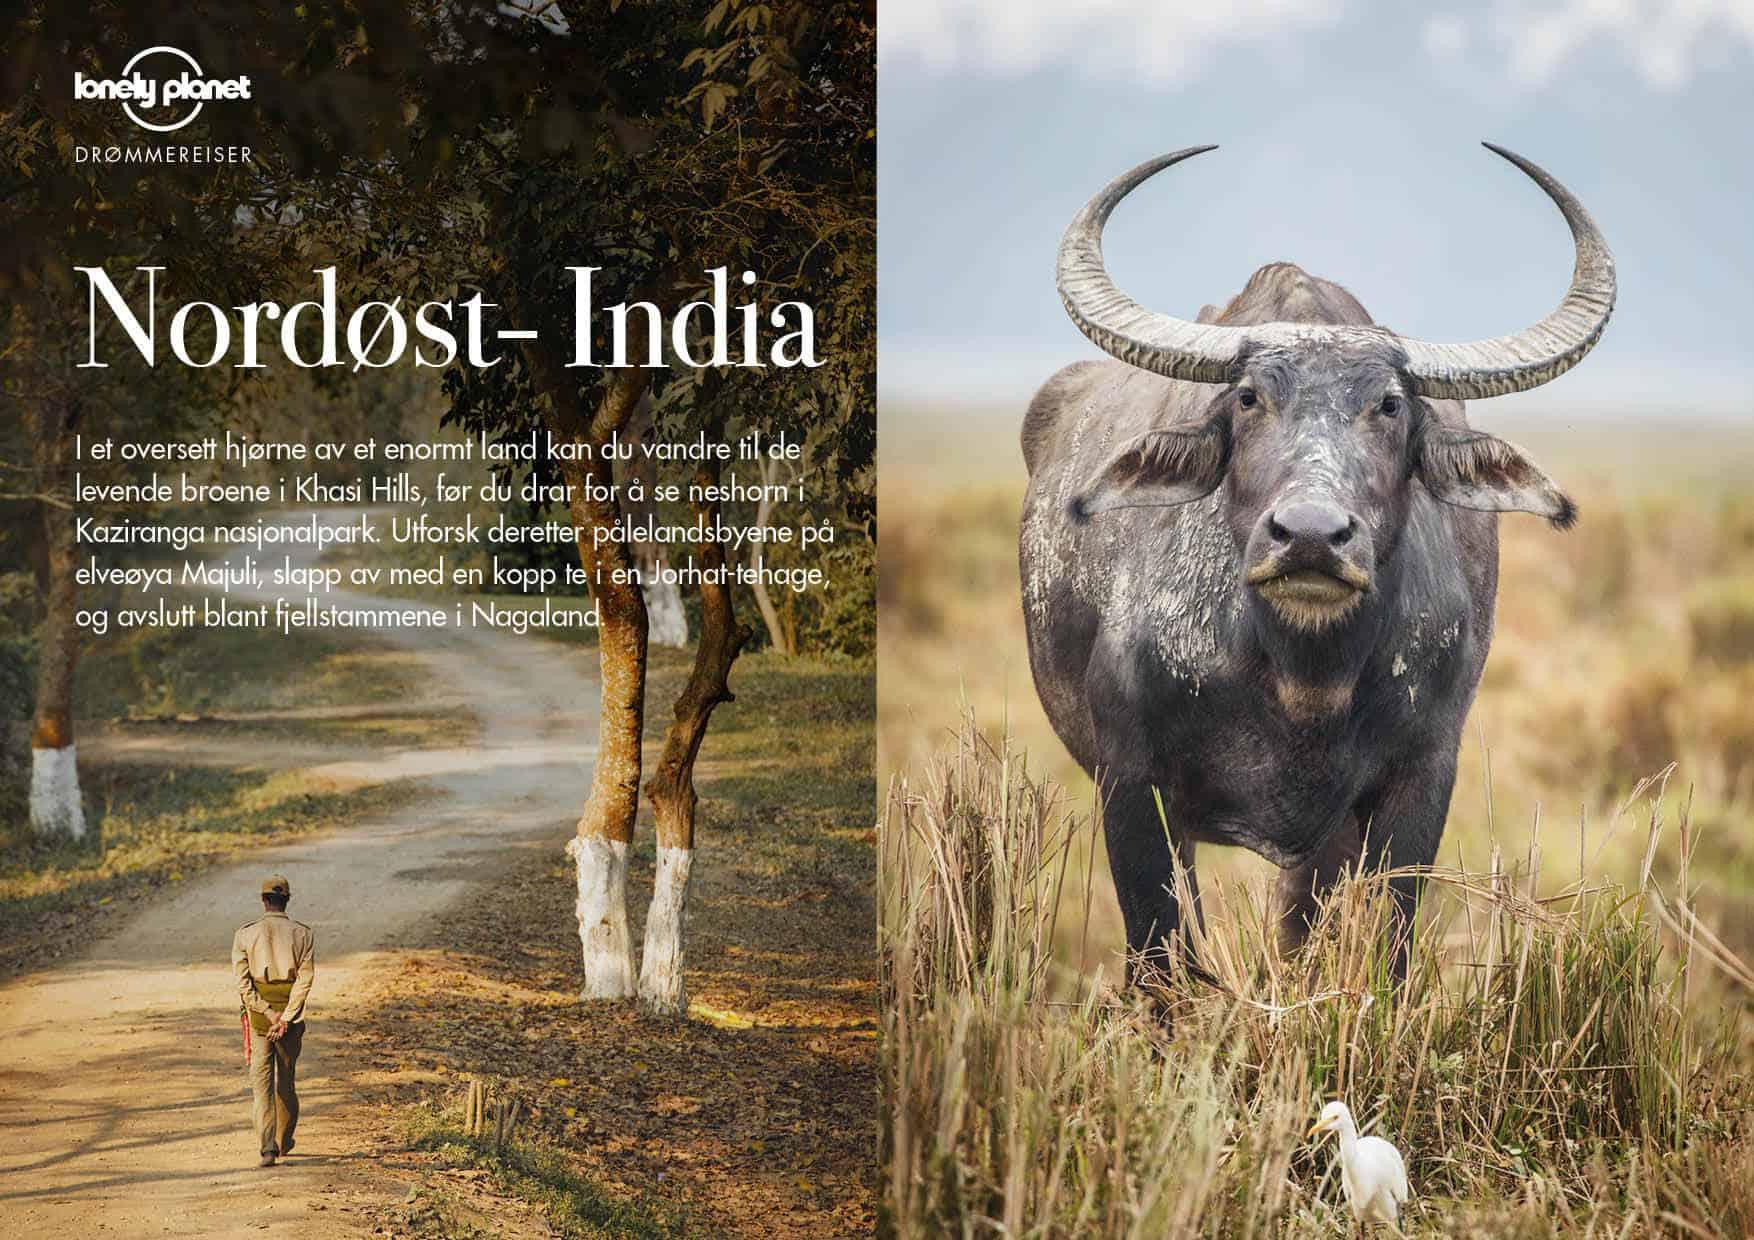 Nordøst-India